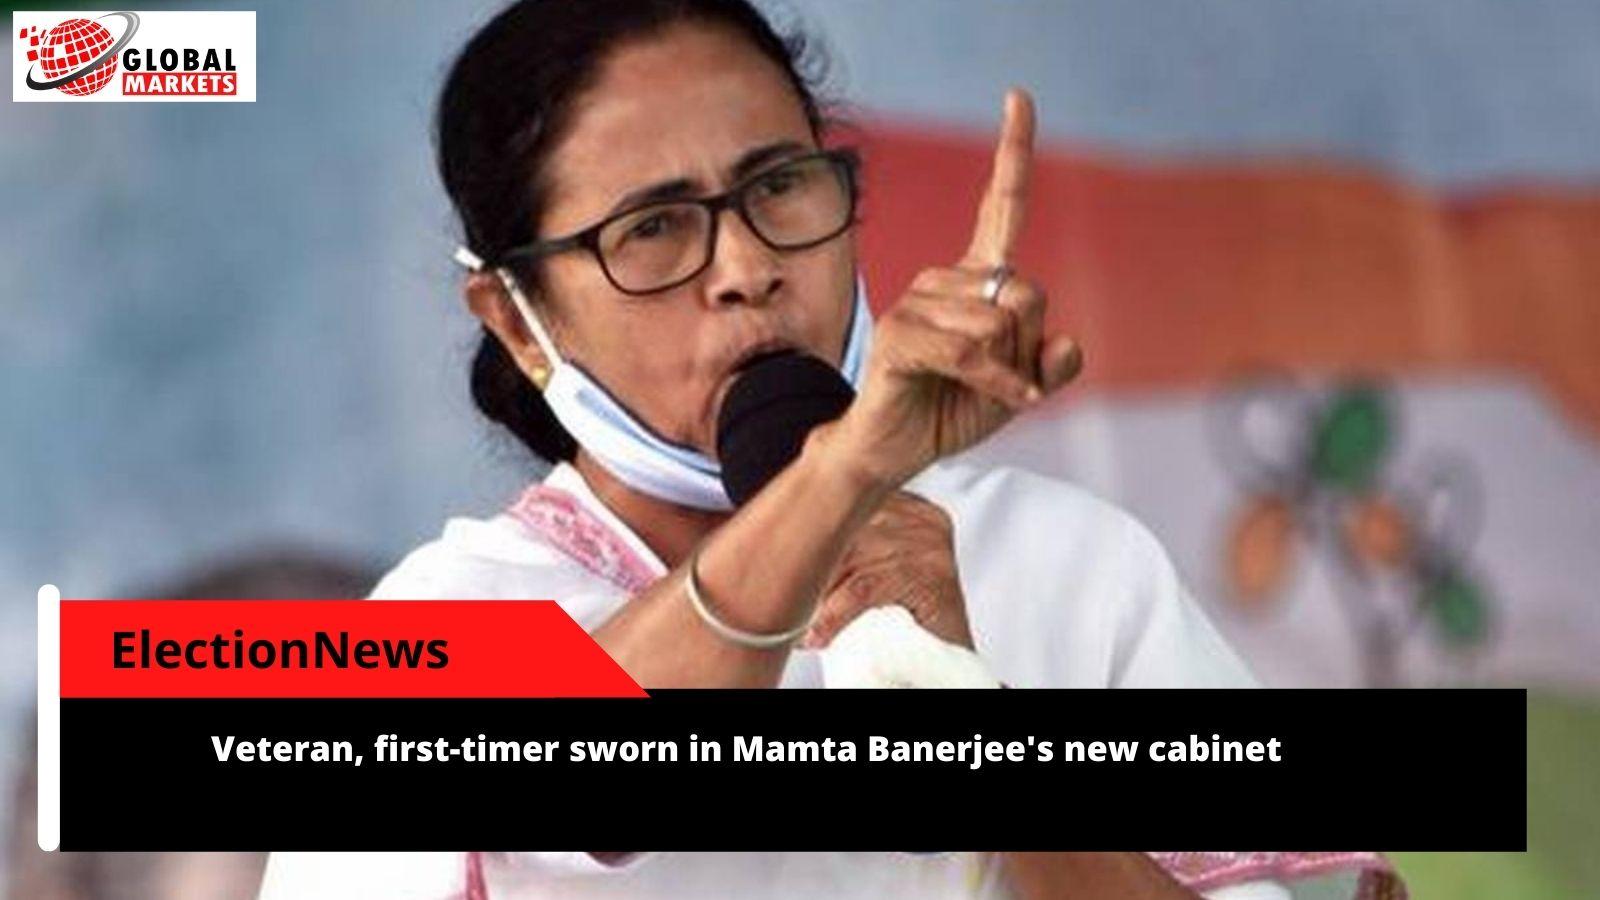 Veteran, first-timer sworn in Mamta Banerjee's new cabinet